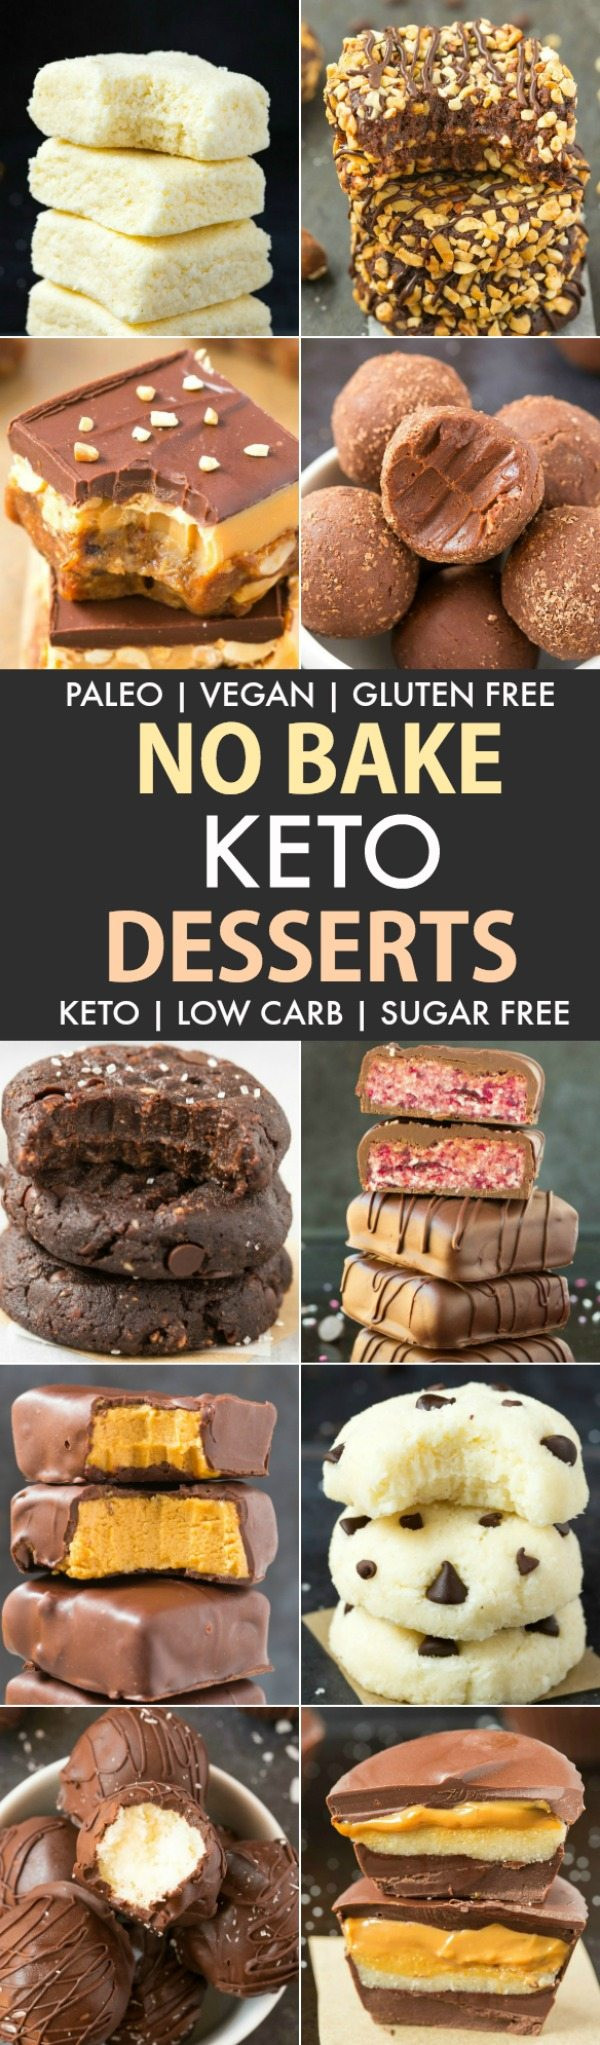 Quick Keto Desserts  Easy No Bake Low Carb Keto Desserts Paleo Vegan